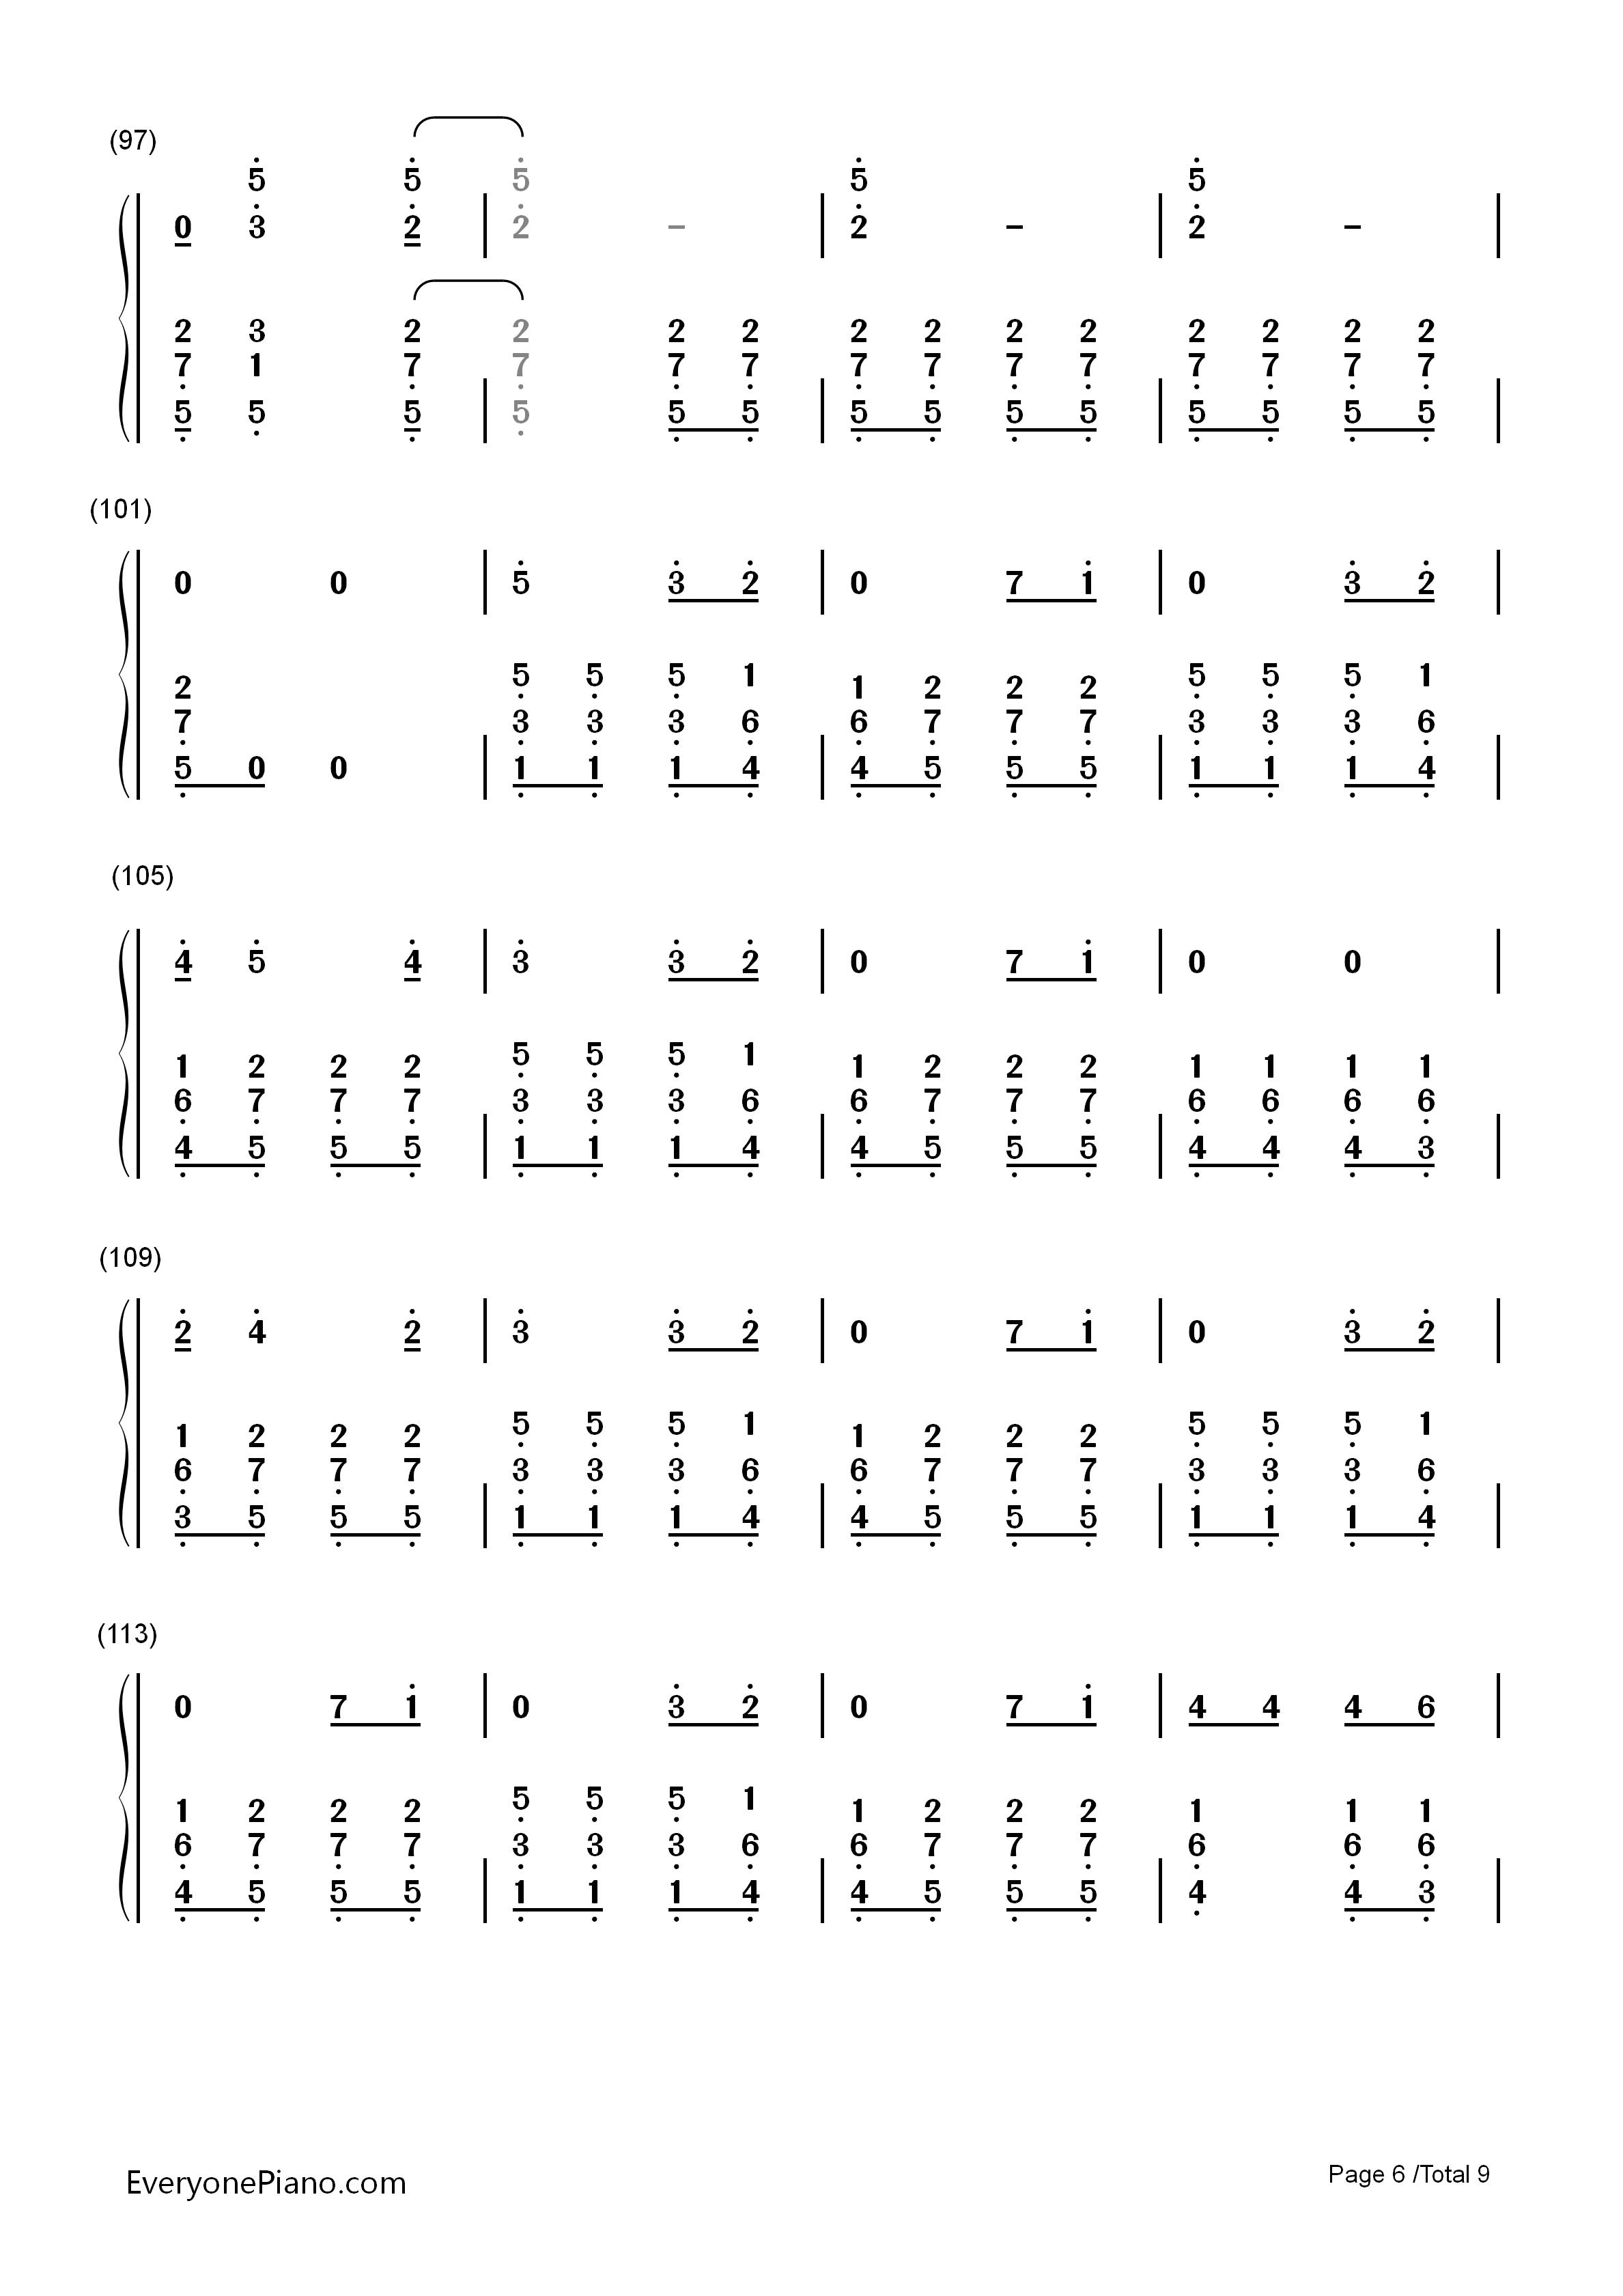 n Day双手简谱预览6 钢琴谱档 五线谱 双手简谱 数位谱 Midi PDF 免